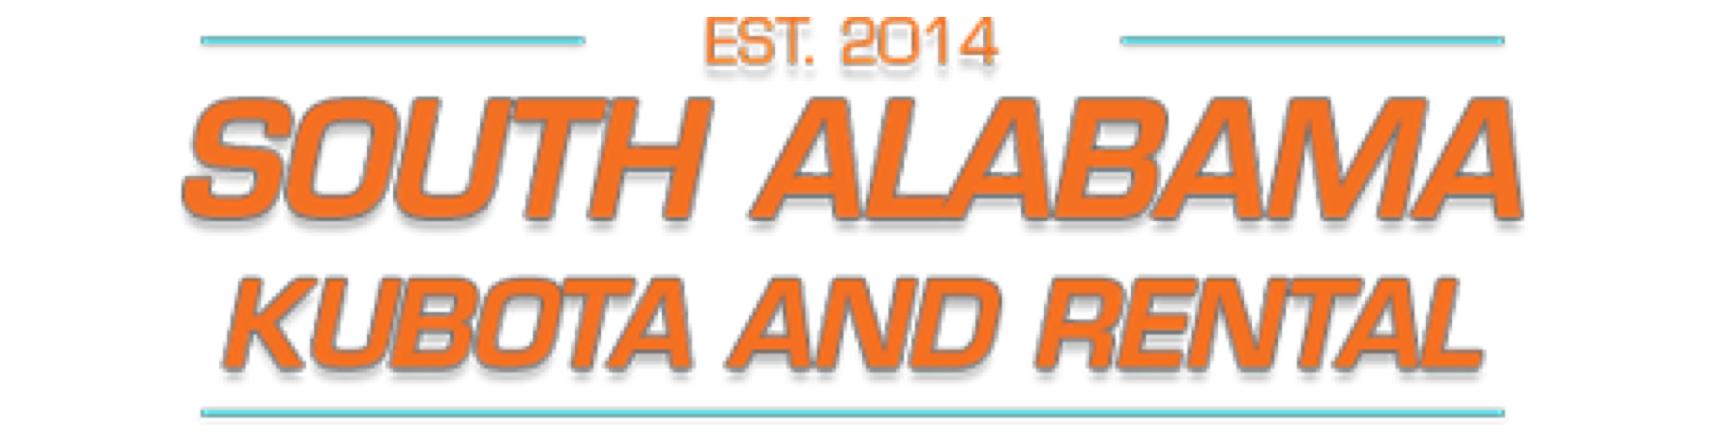 South Alabama Kubota and Rental Logo